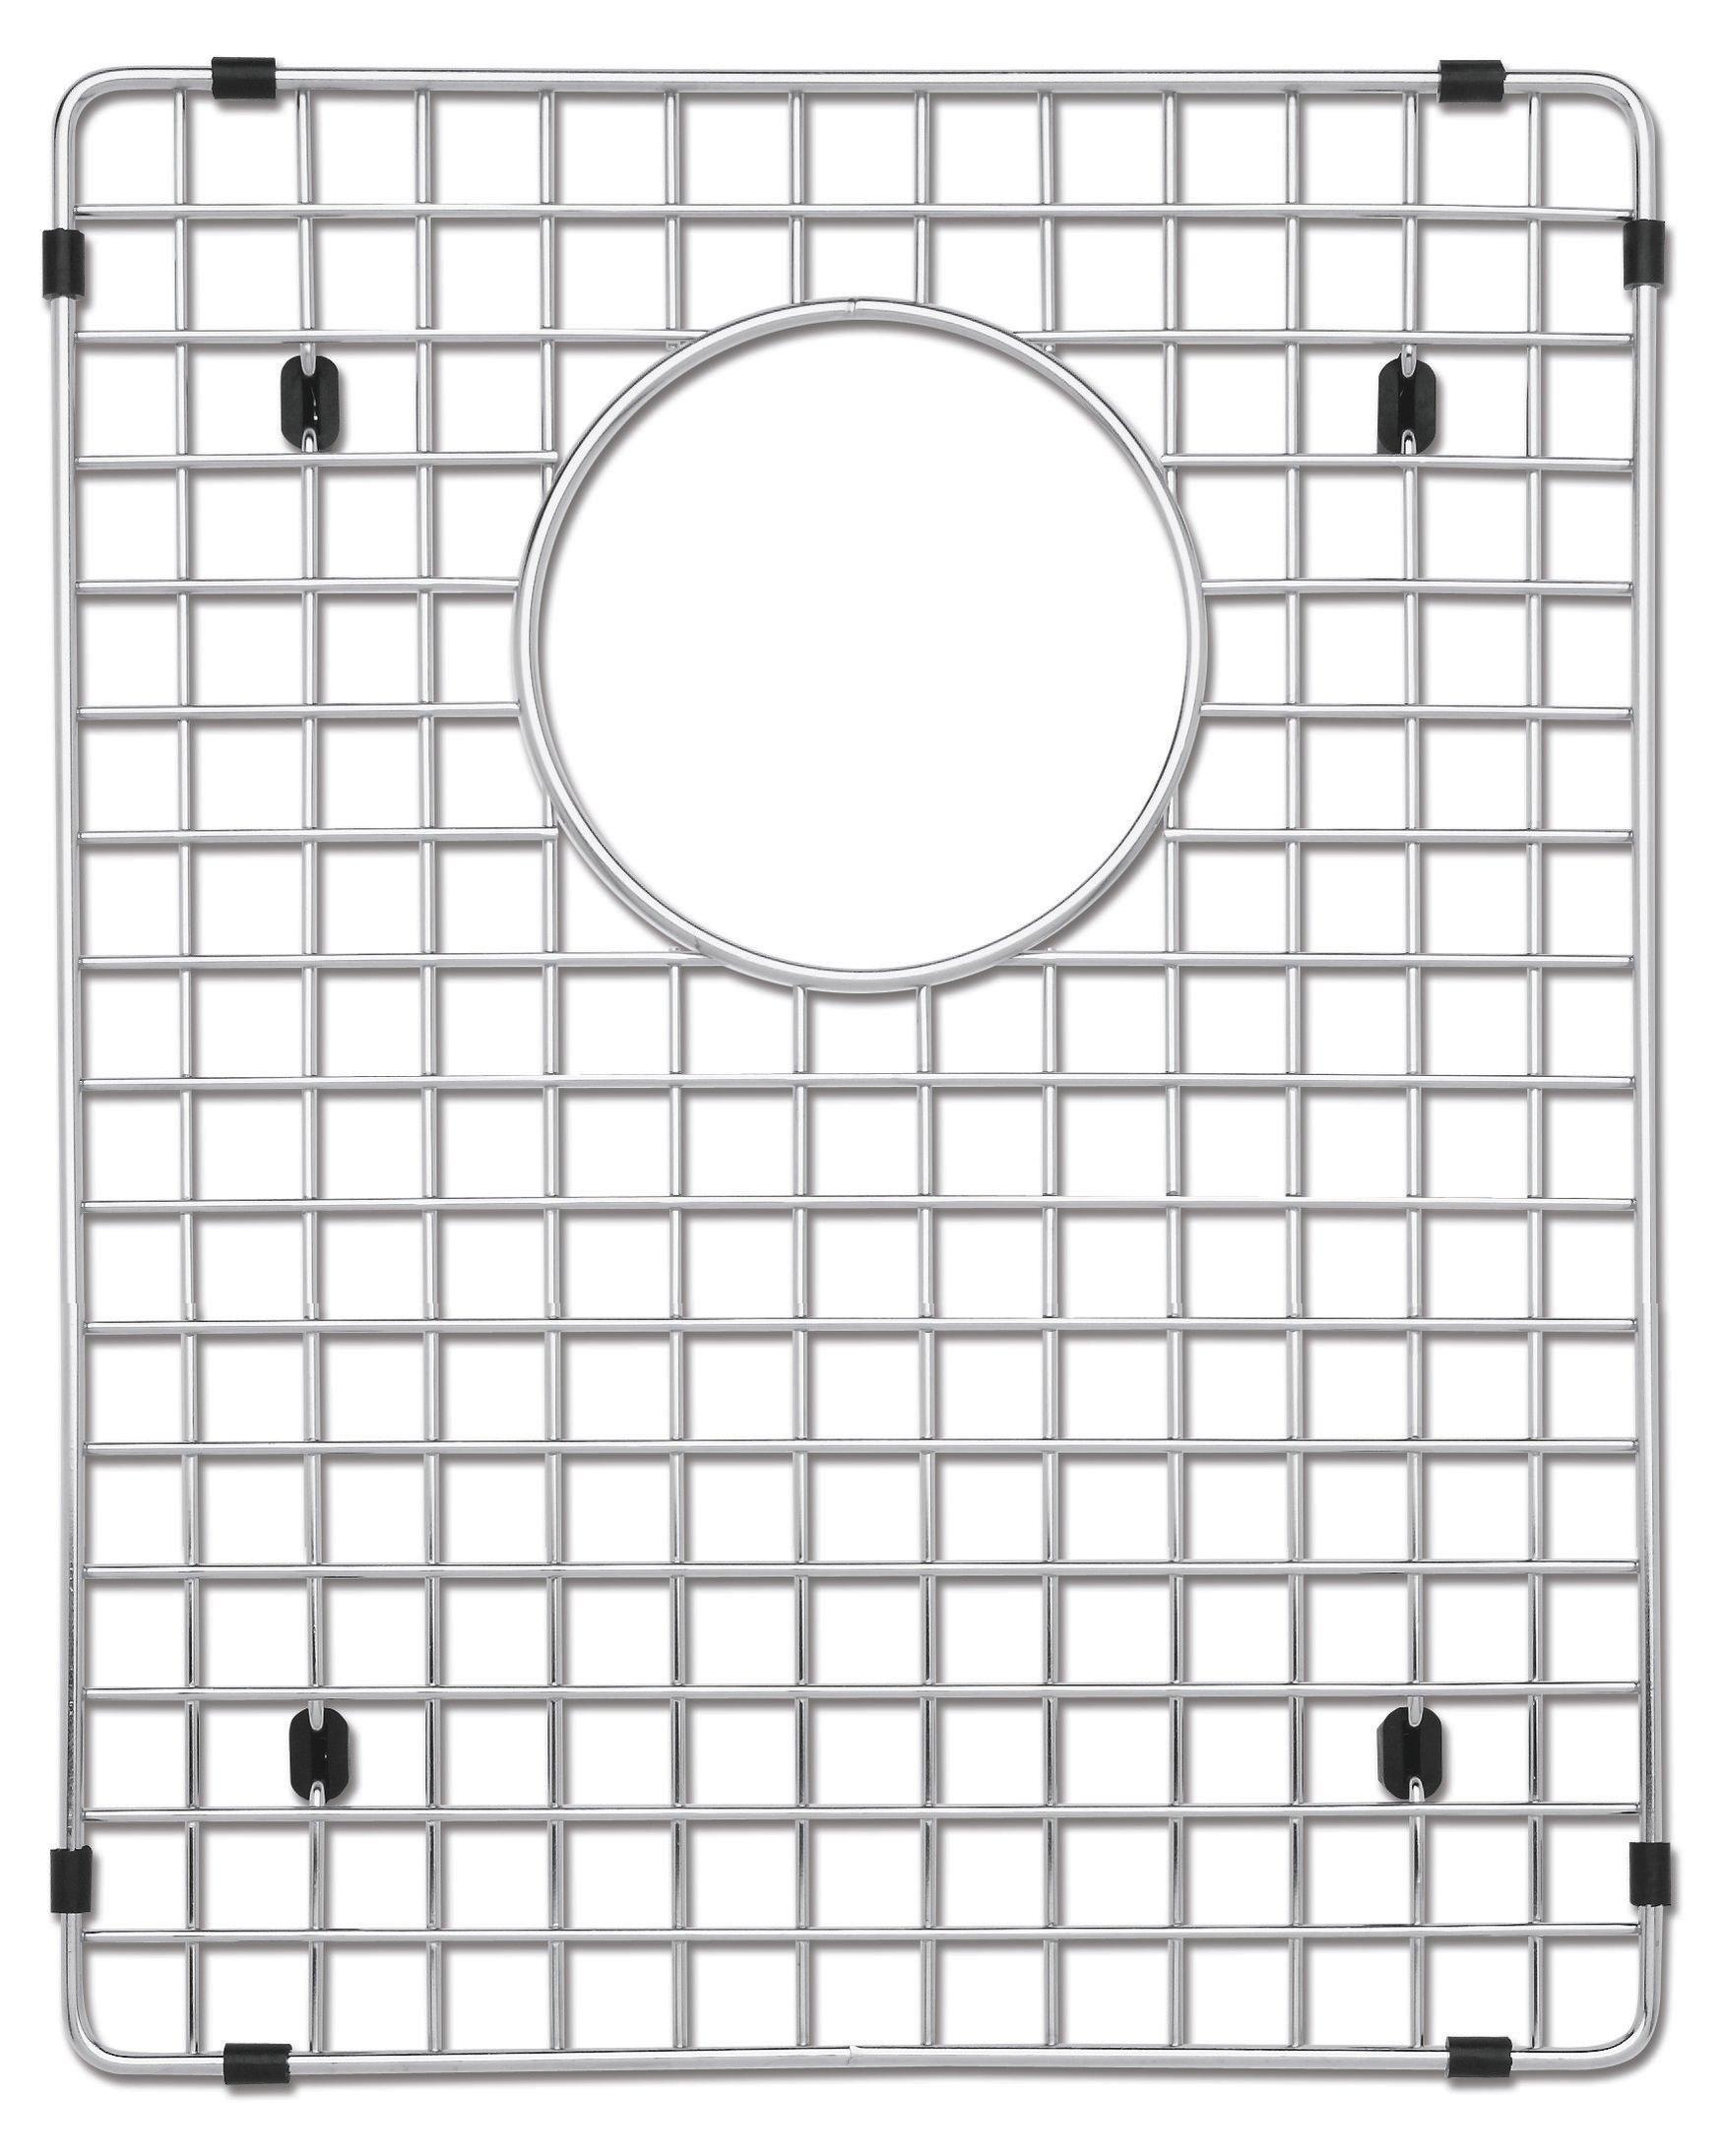 Blanco 223189 Stainless Steel Sink Grid, Fits Precision and Precision 10 1-3/4 Bowl right bowl, Stainless Steel